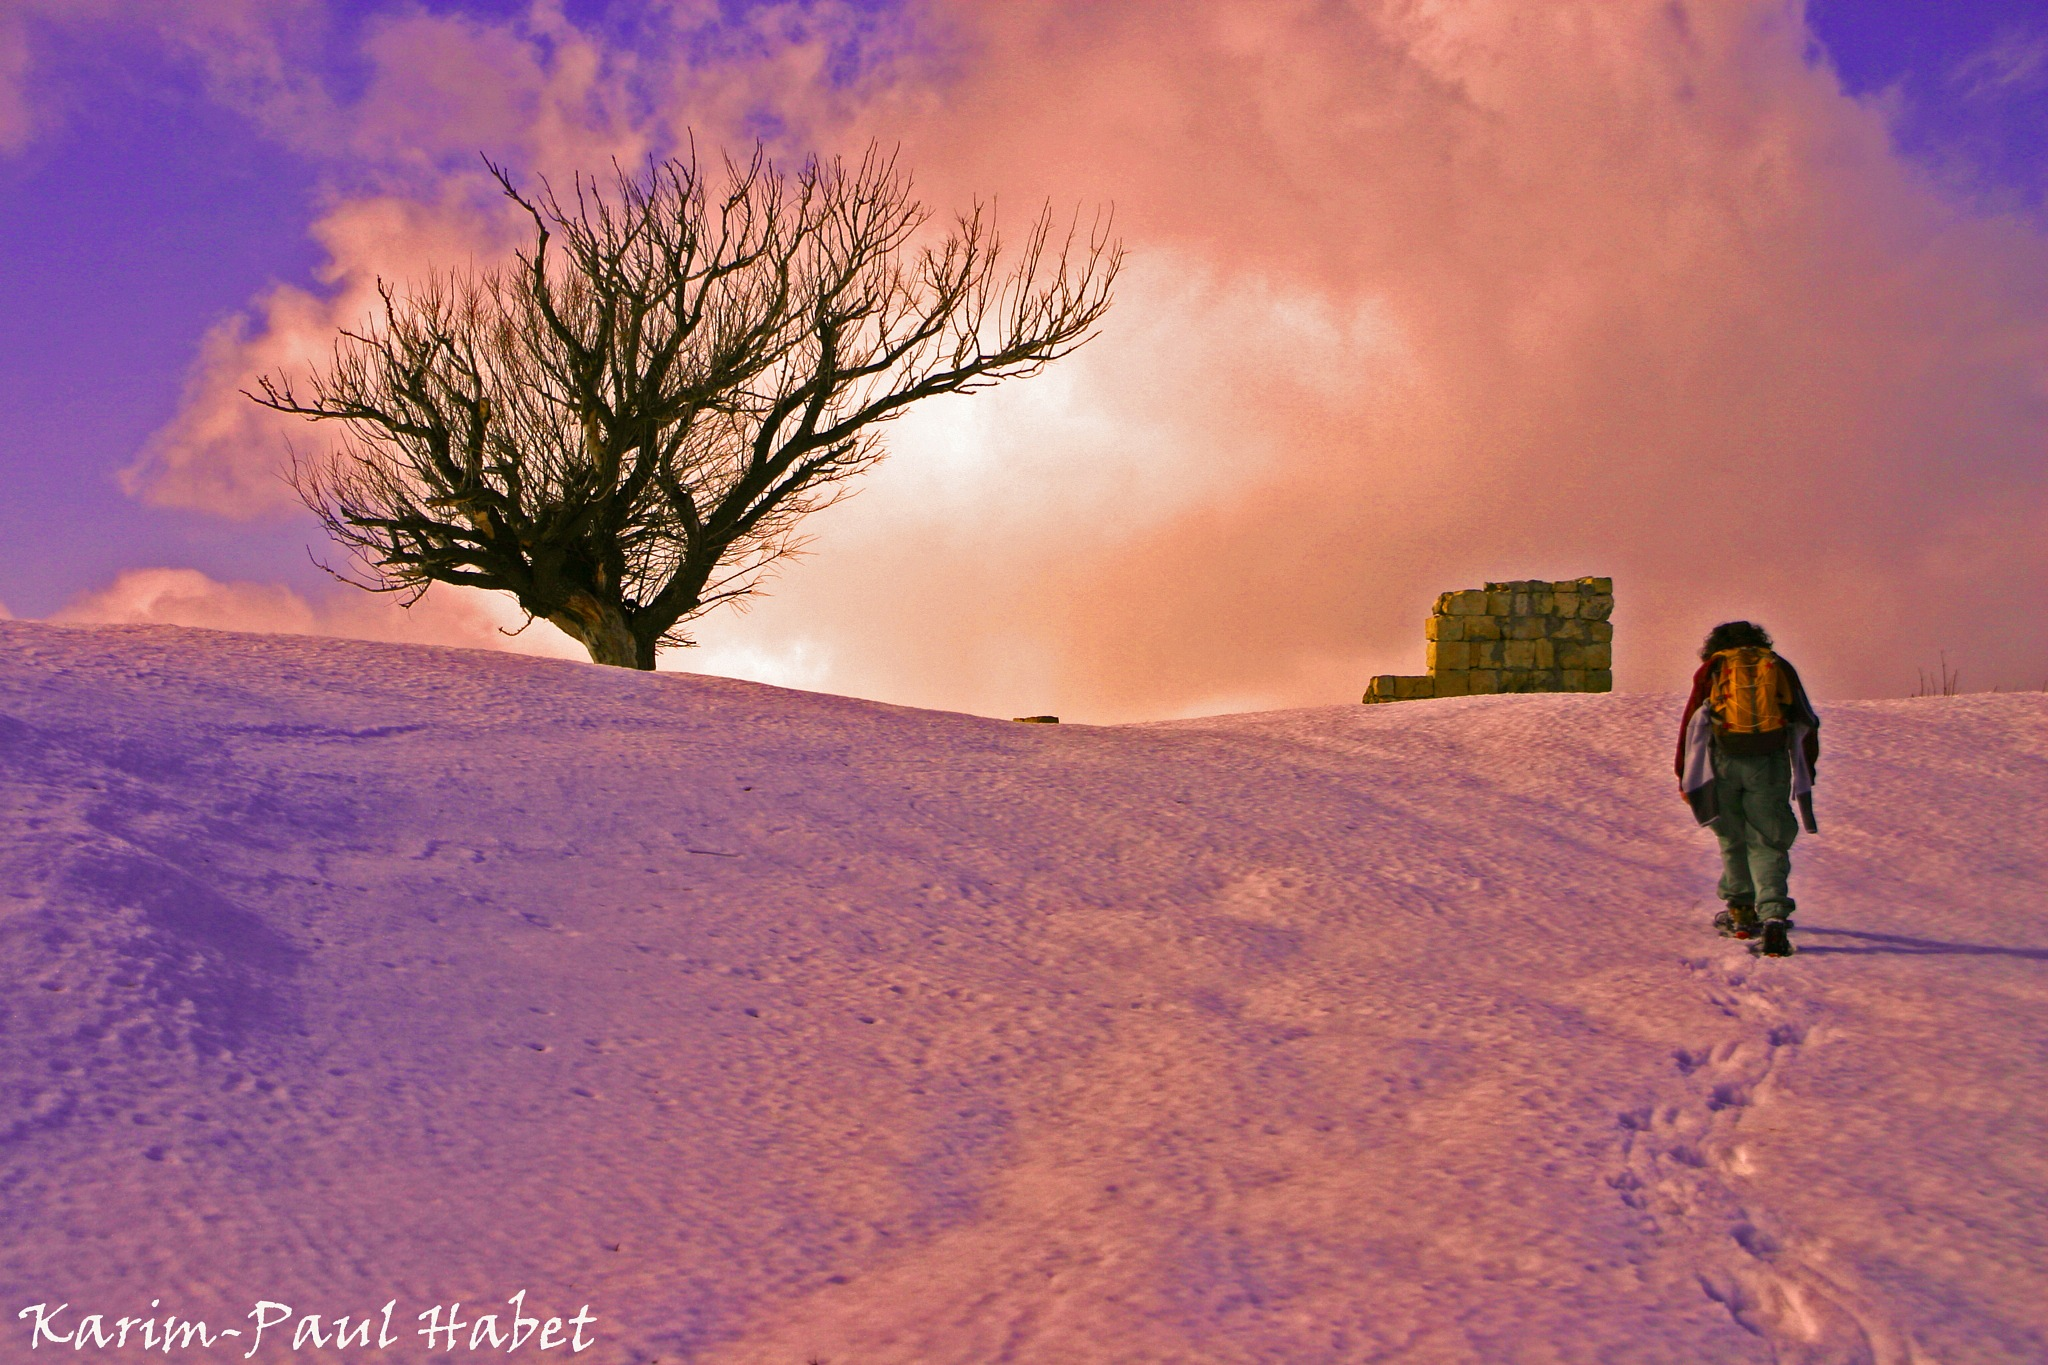 .....to the edge.... by Karim-Paul Habet